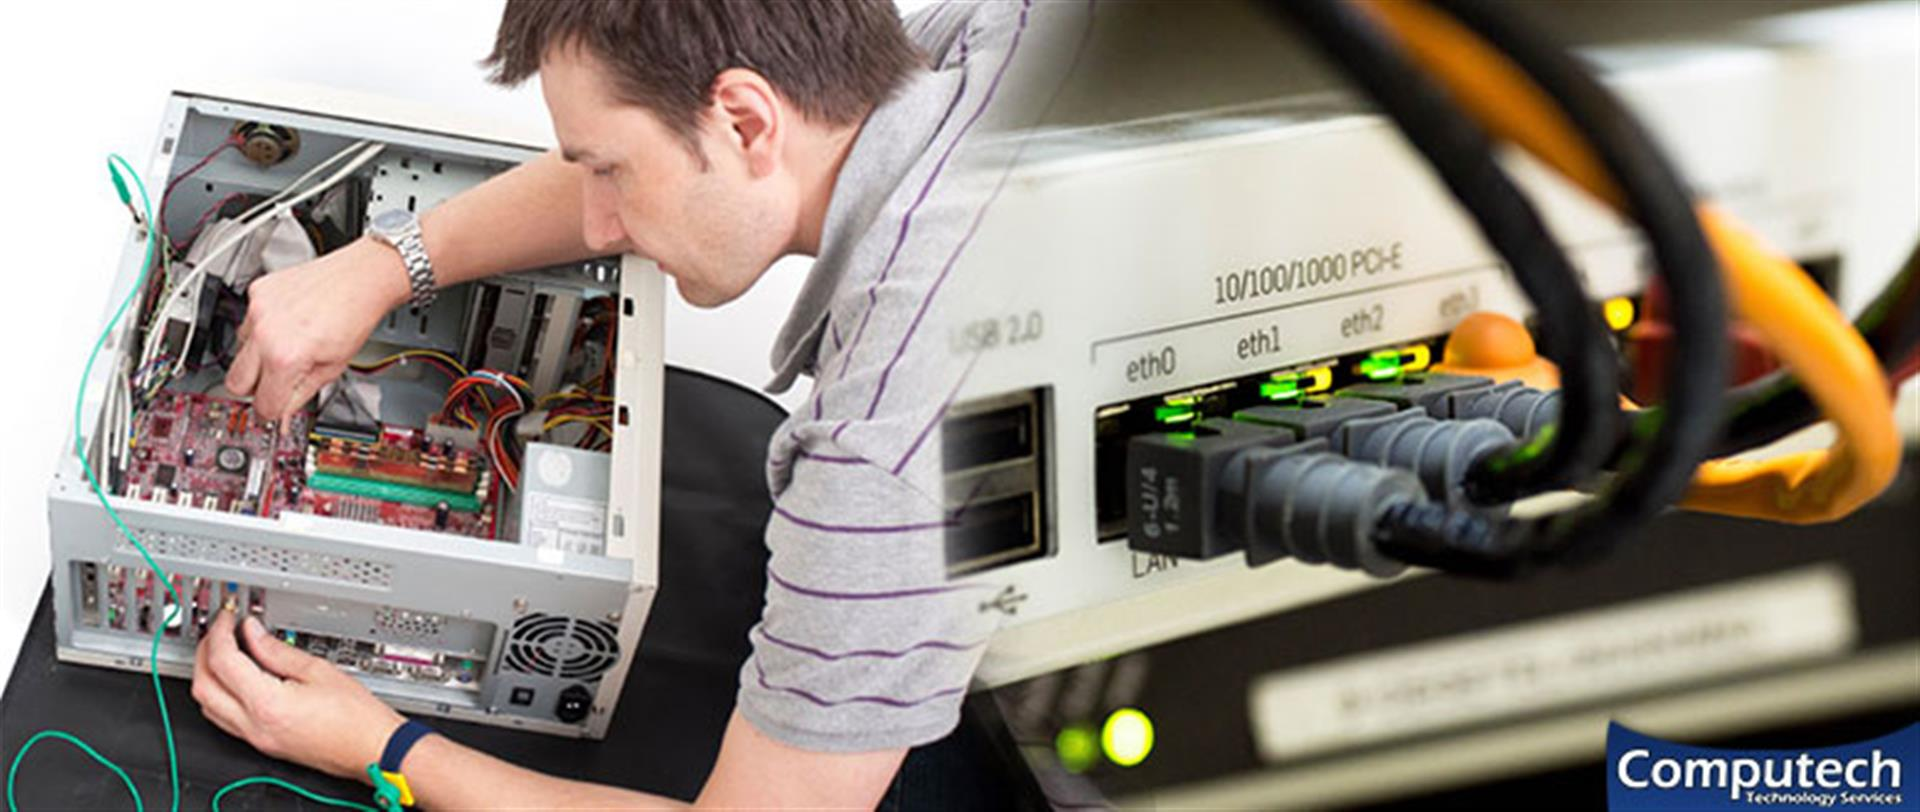 Sylacauga Alabama On Site PC & Printer Repair, Networks, Telecom & Data Cabling Services